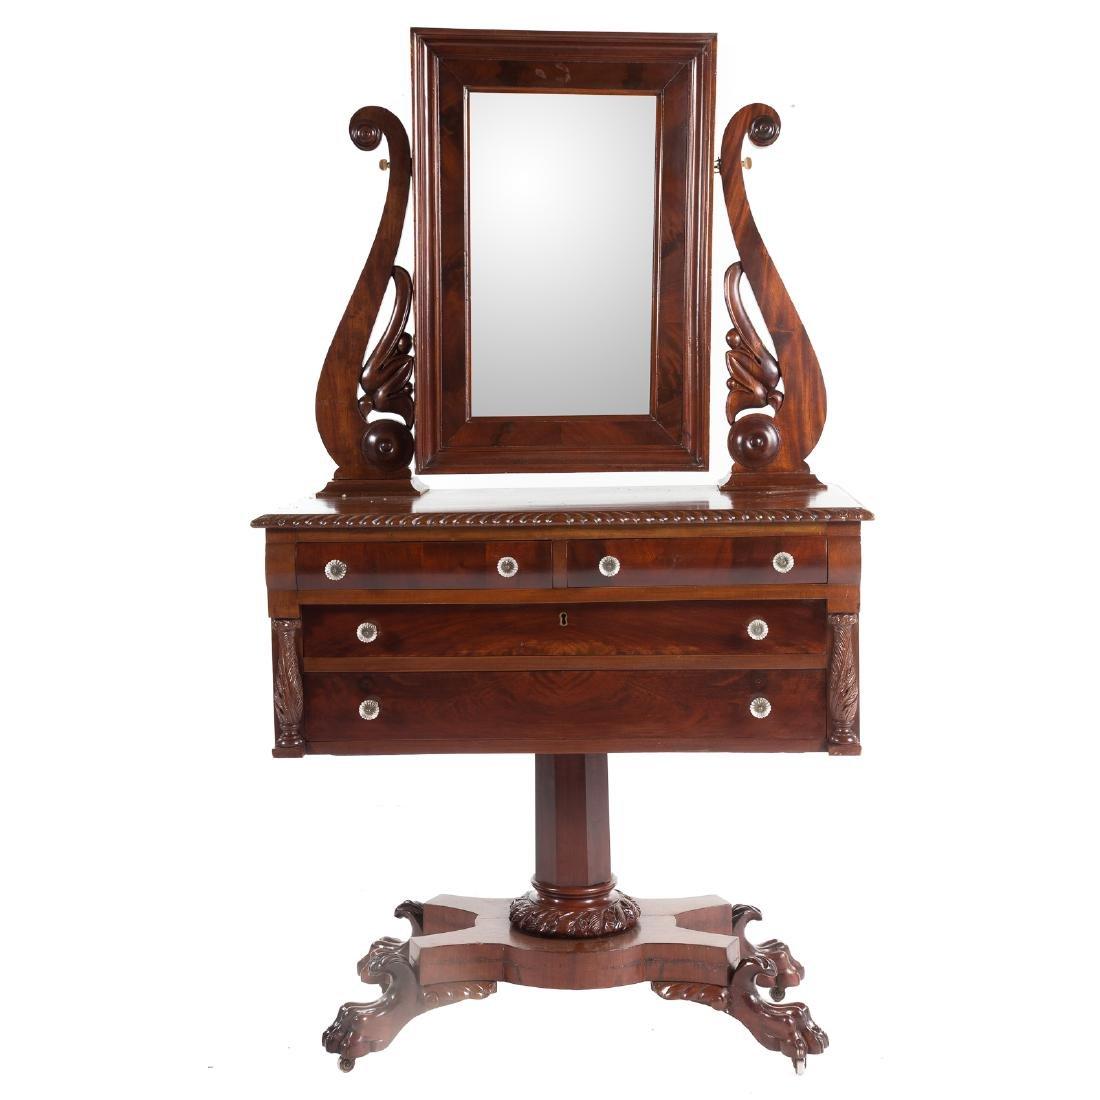 Classical Revival mahogany dressing table